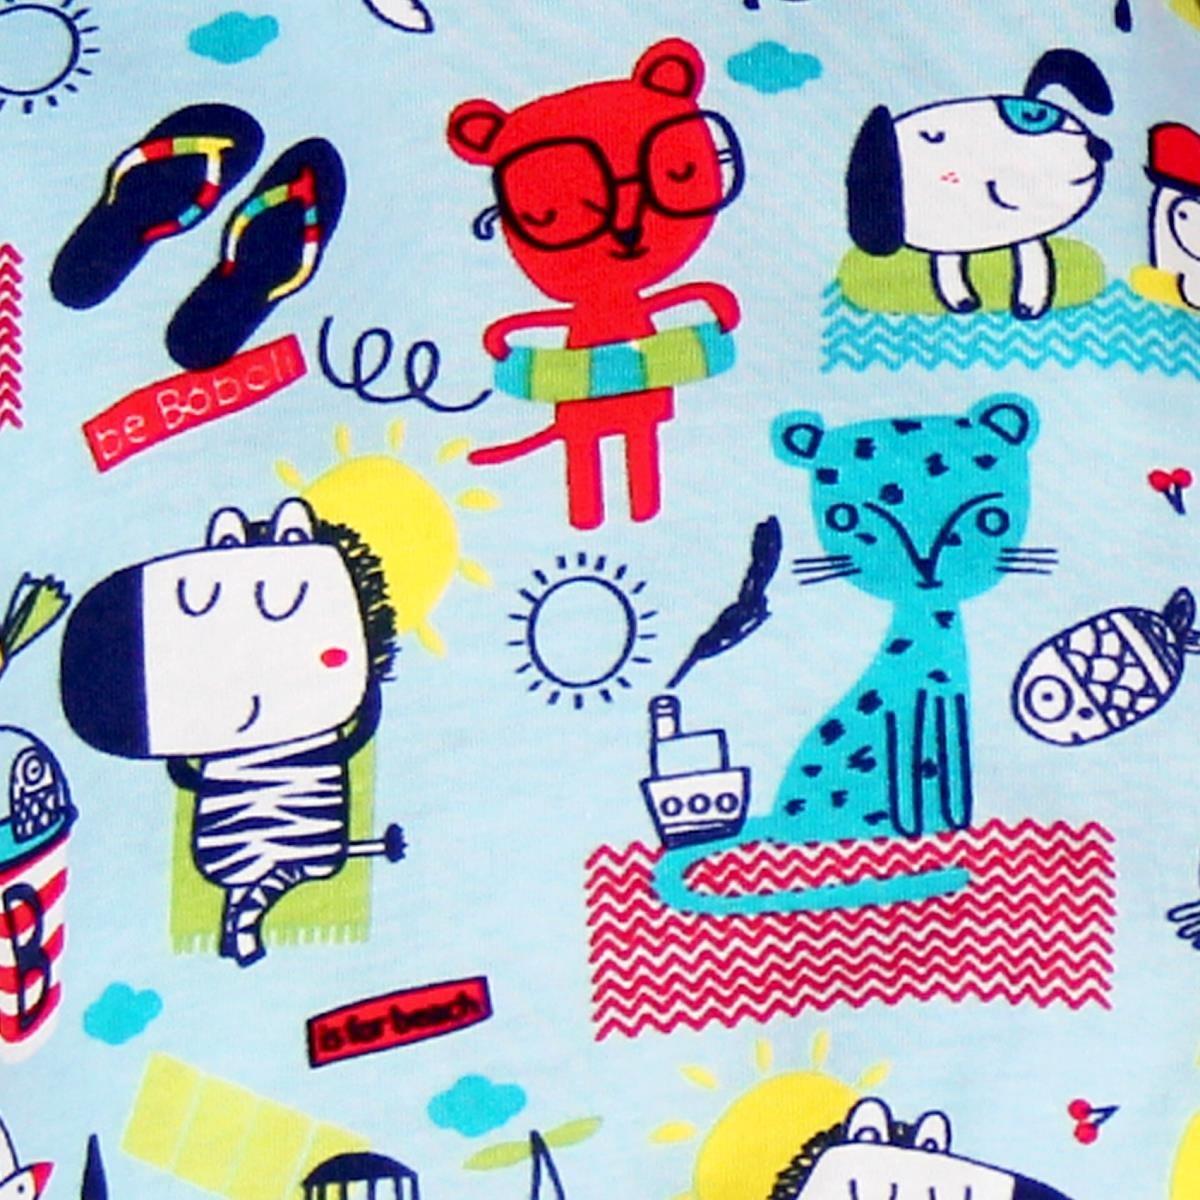 boboli Knit Play Suit for Baby Ghette Unisex-Bimbi